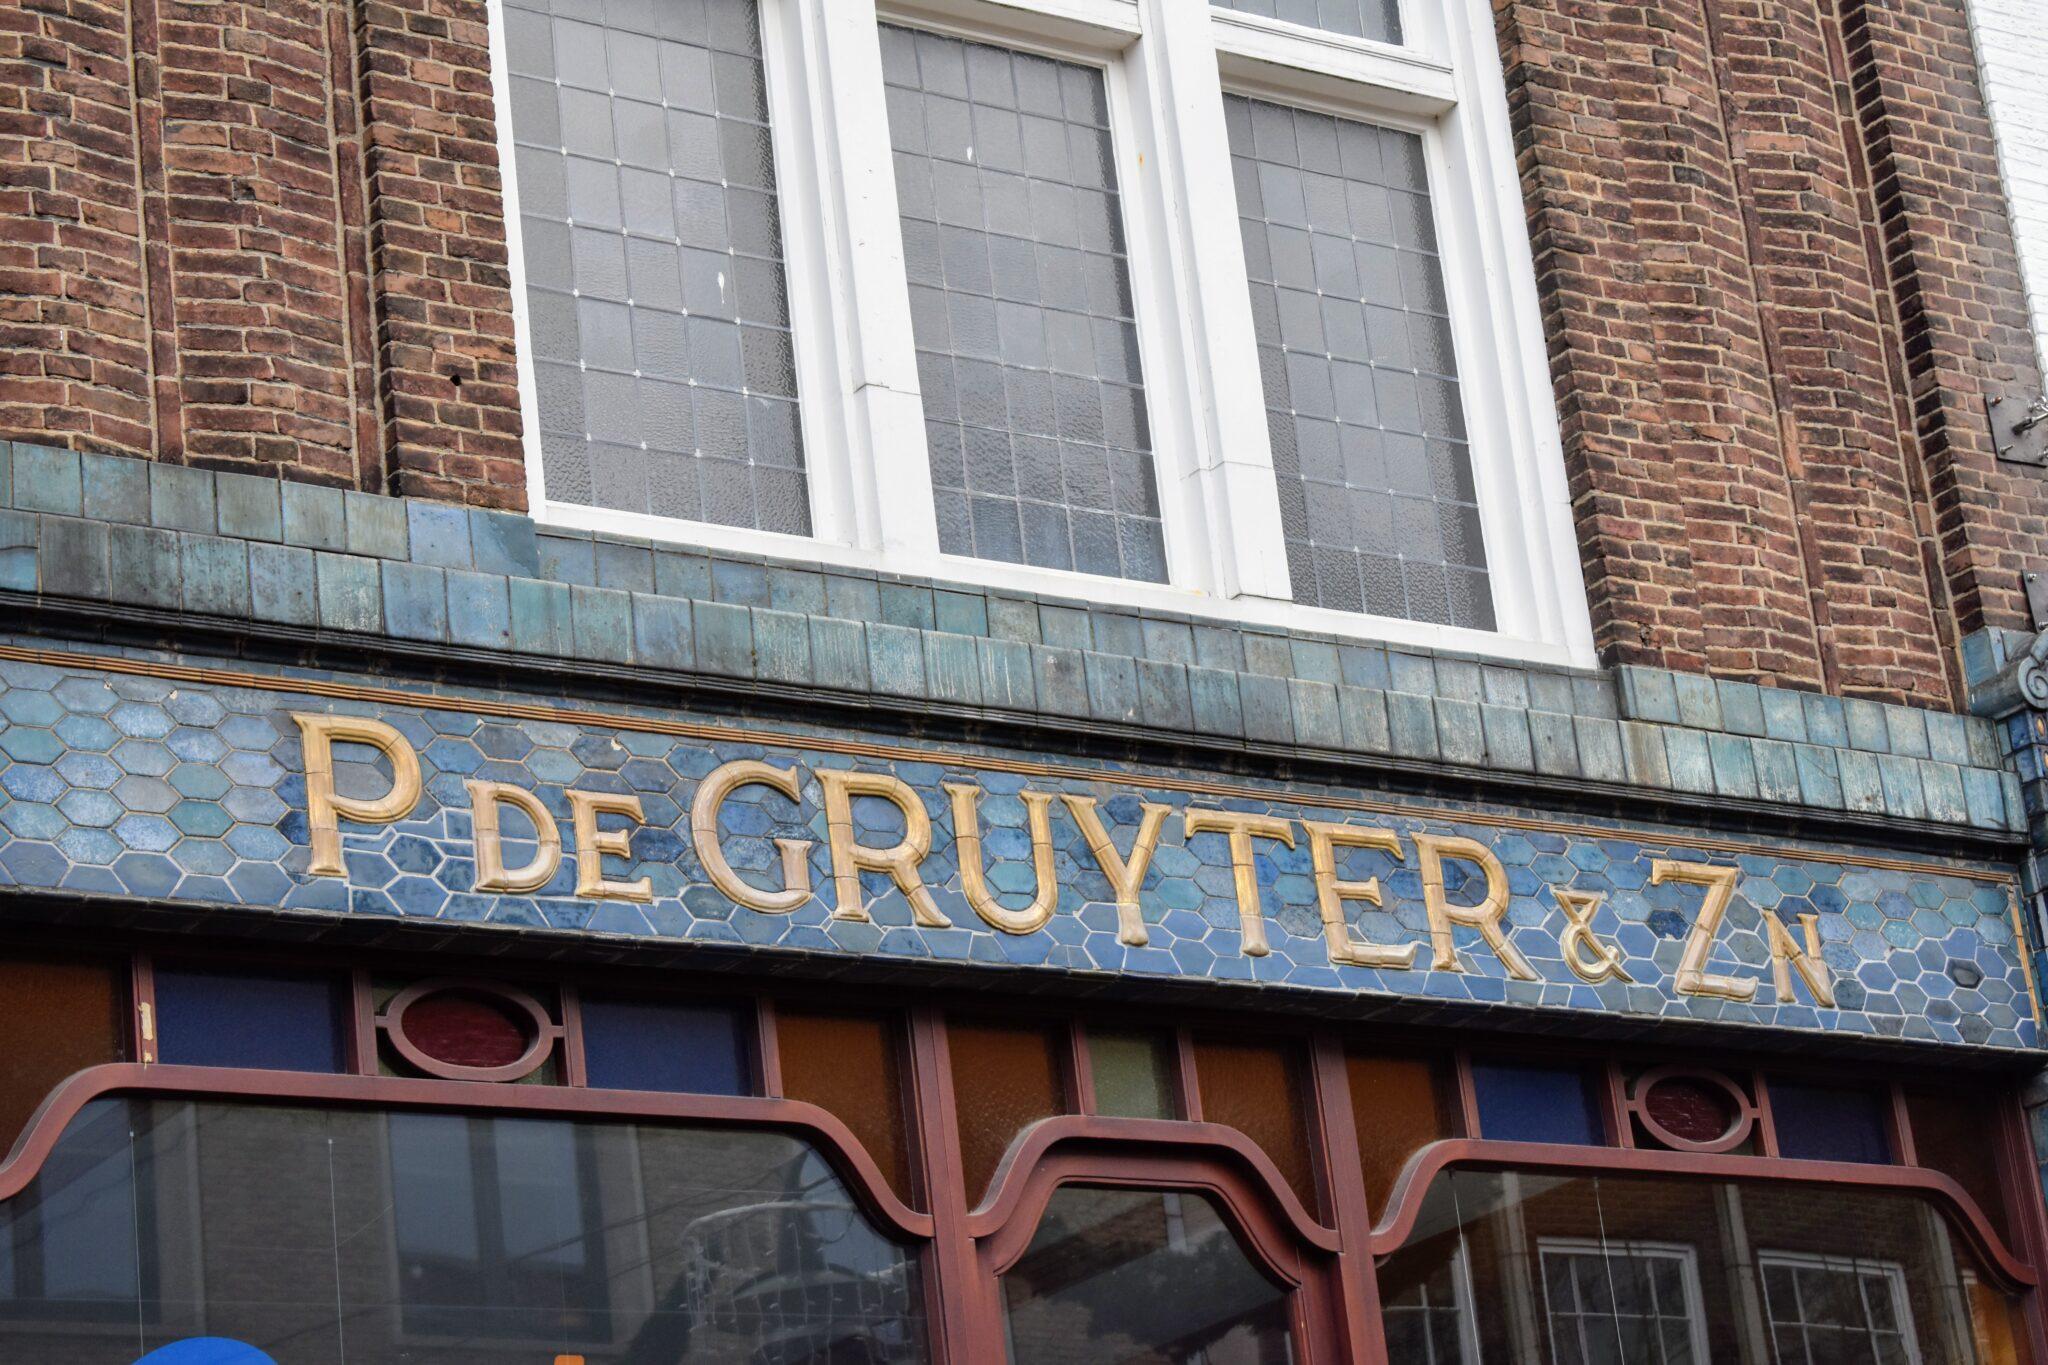 P de Gruyter zn Helmond